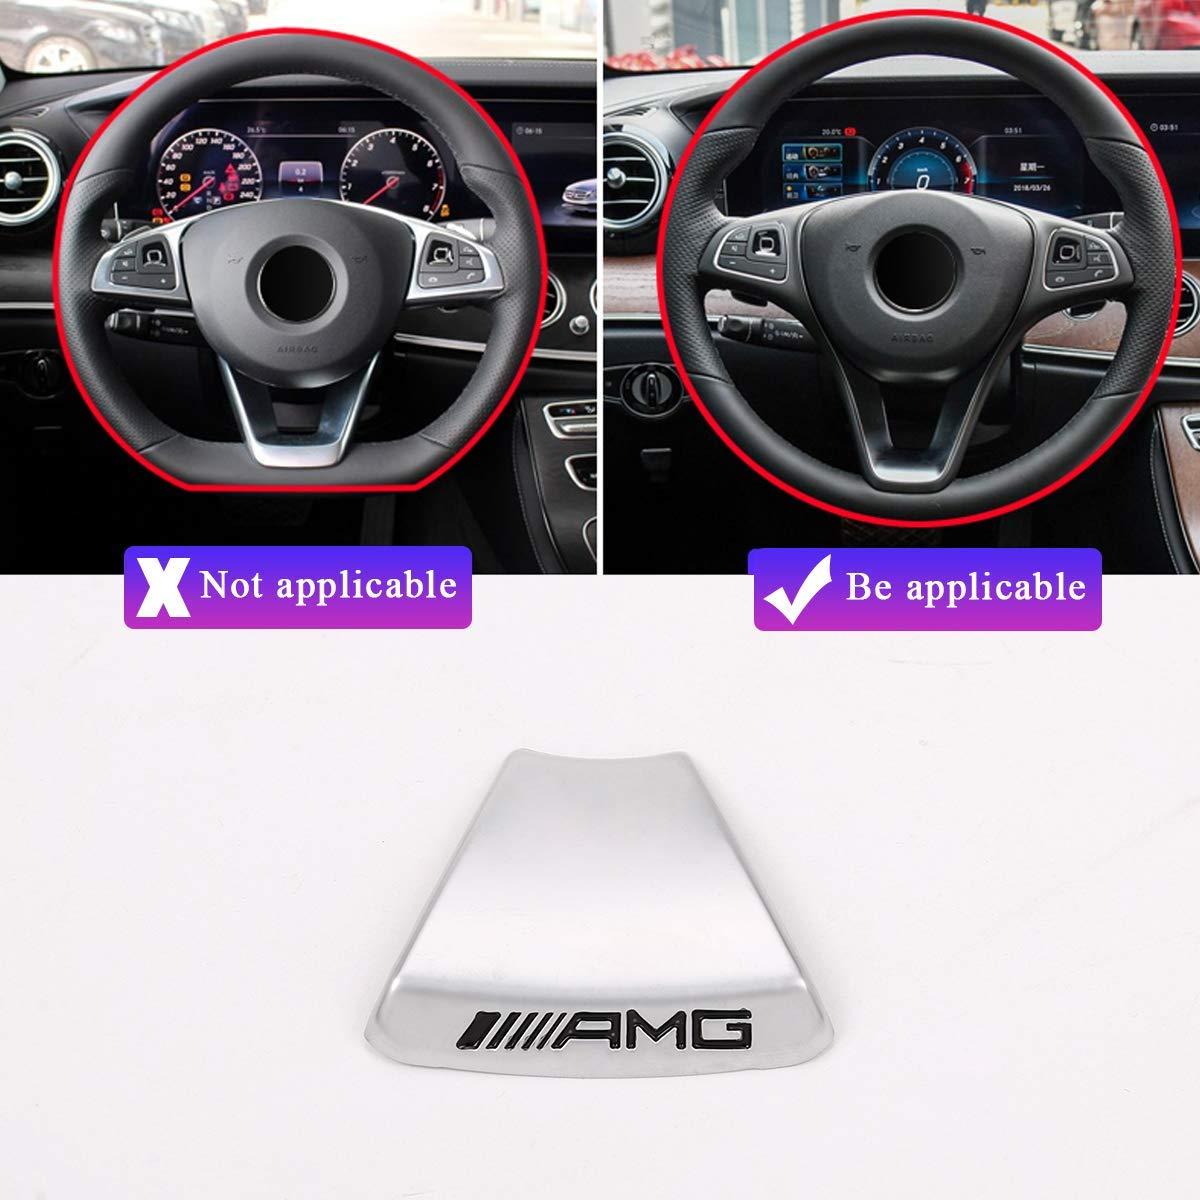 YIWANG Zinc Alloy Steering Wheel Emblem Decor Decal Sticker Badge Decoration AMG Logo For Benz A B C E Class GLA CLA GLC GLE GLS W213 W205 x253 Square sports steering wheel